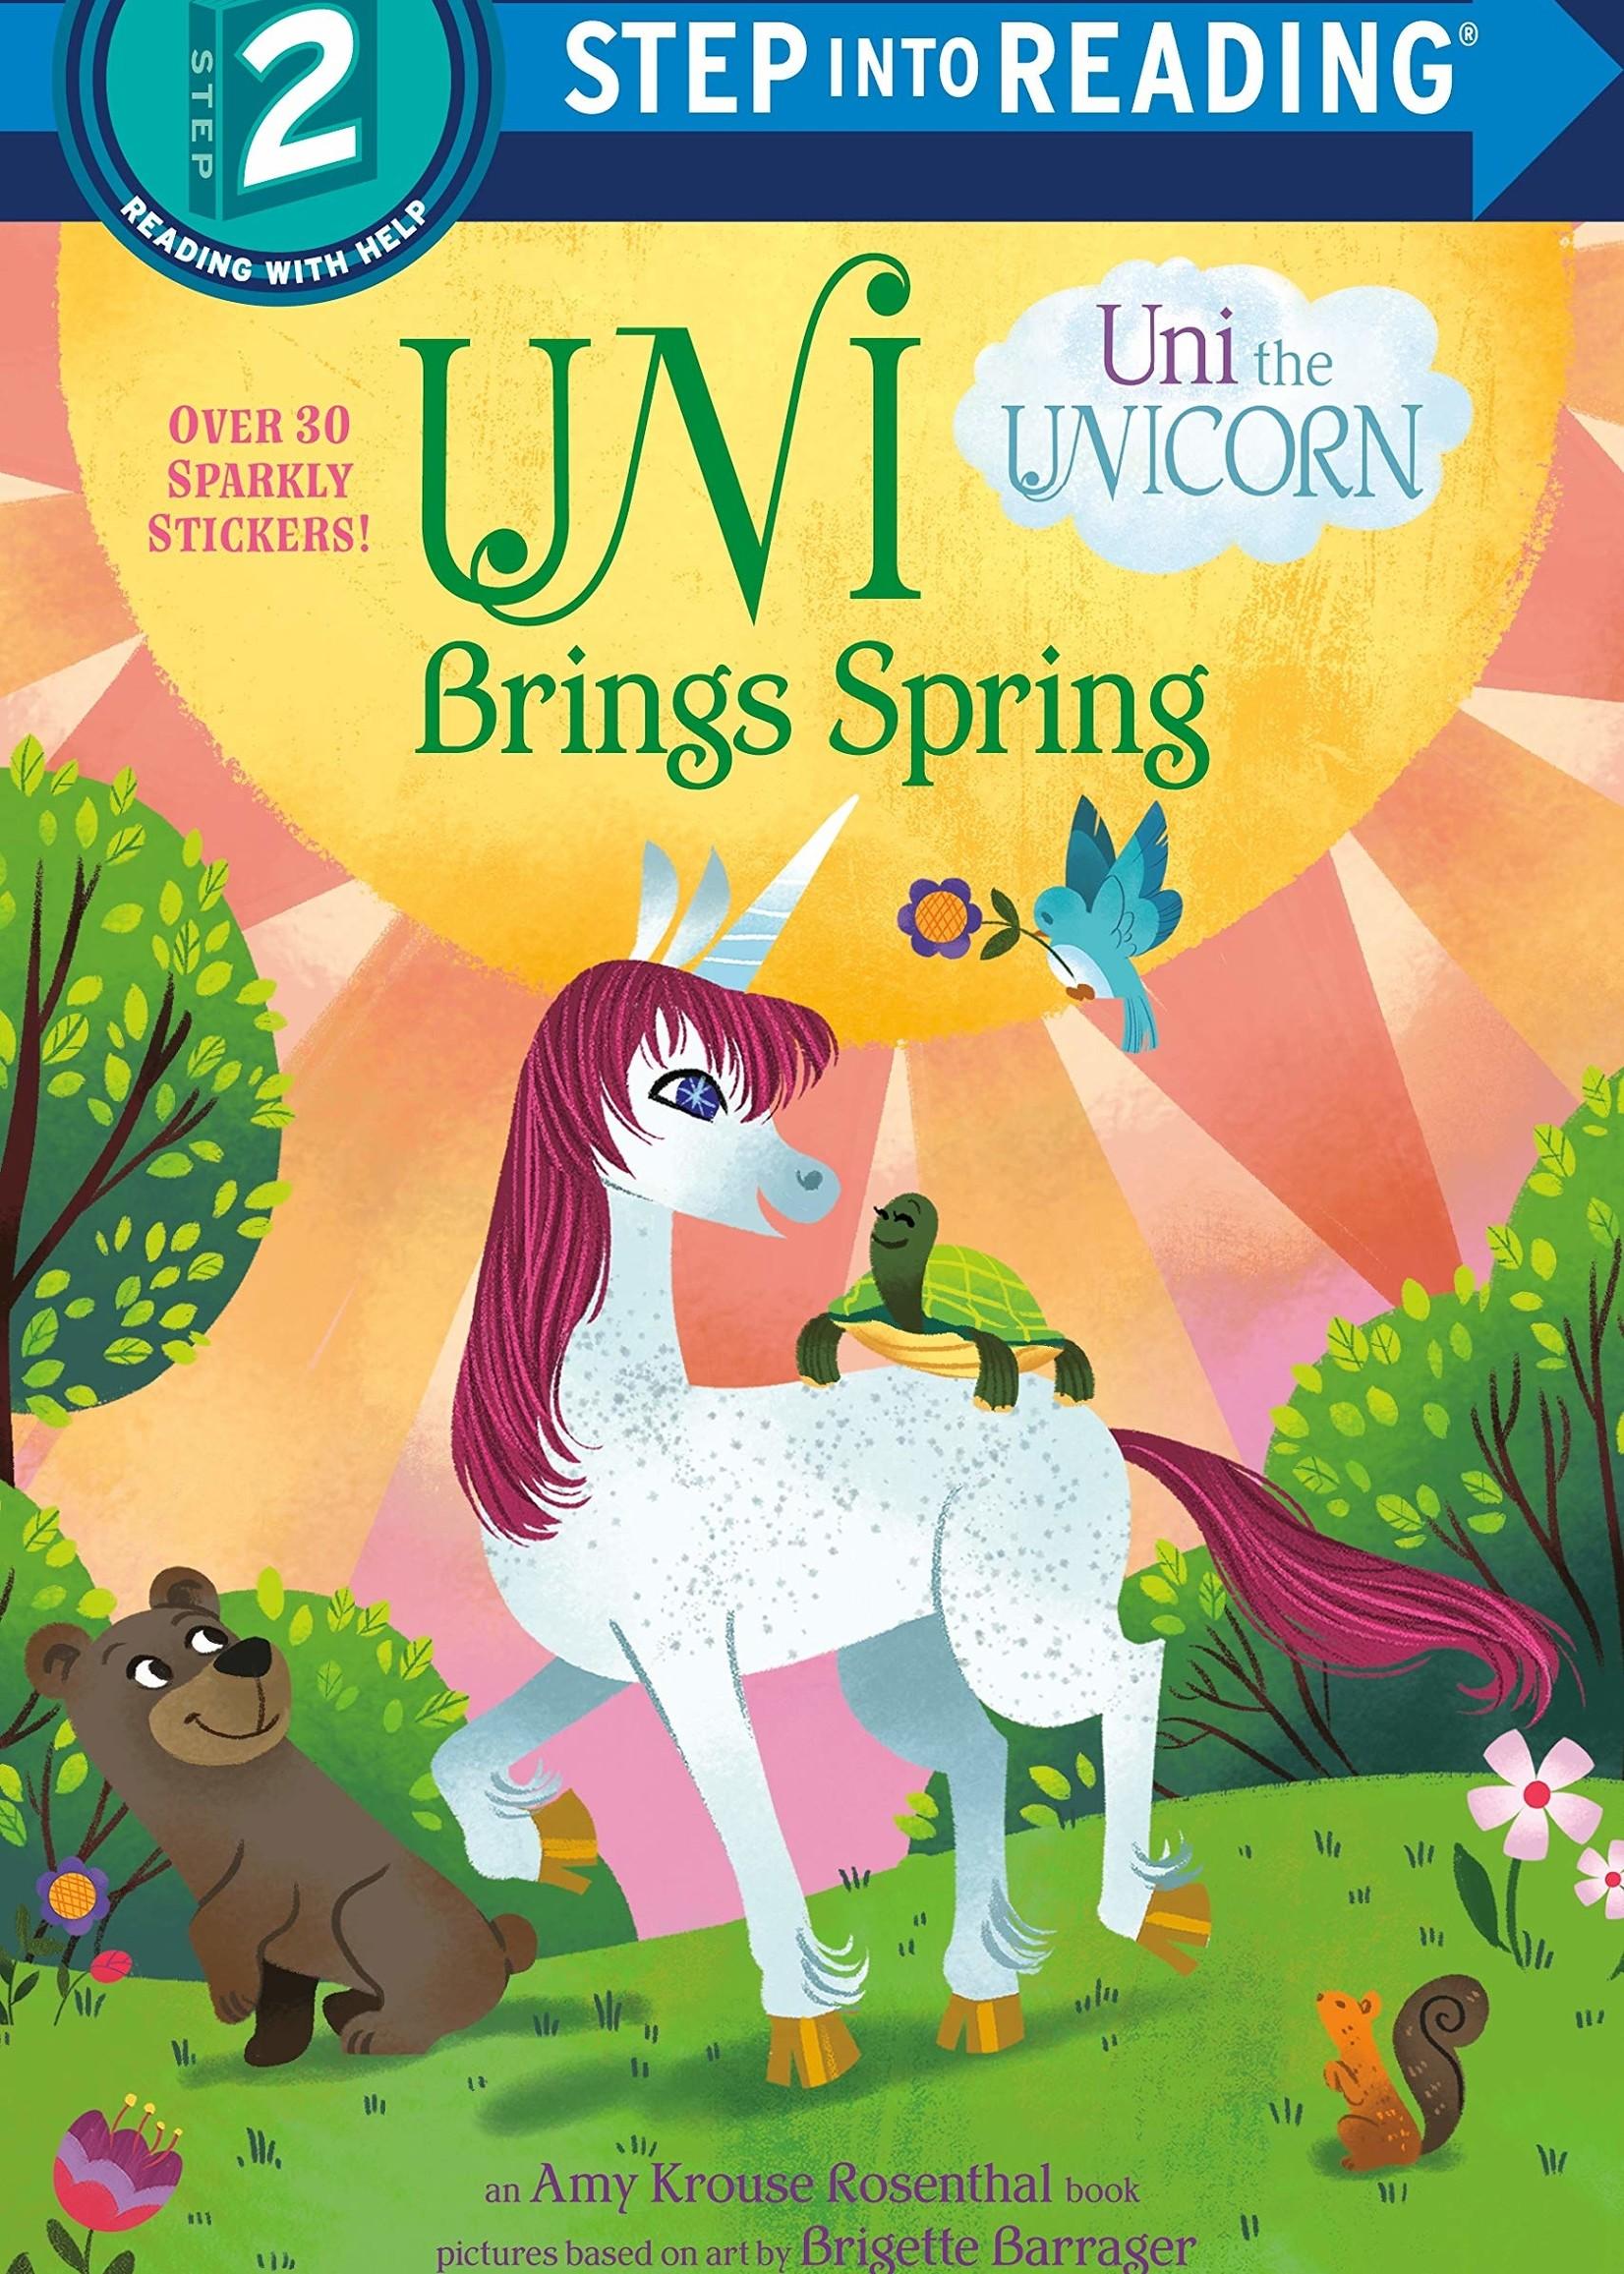 Uni the Unicorn, Uni Brings Spring - Level 2 Reader